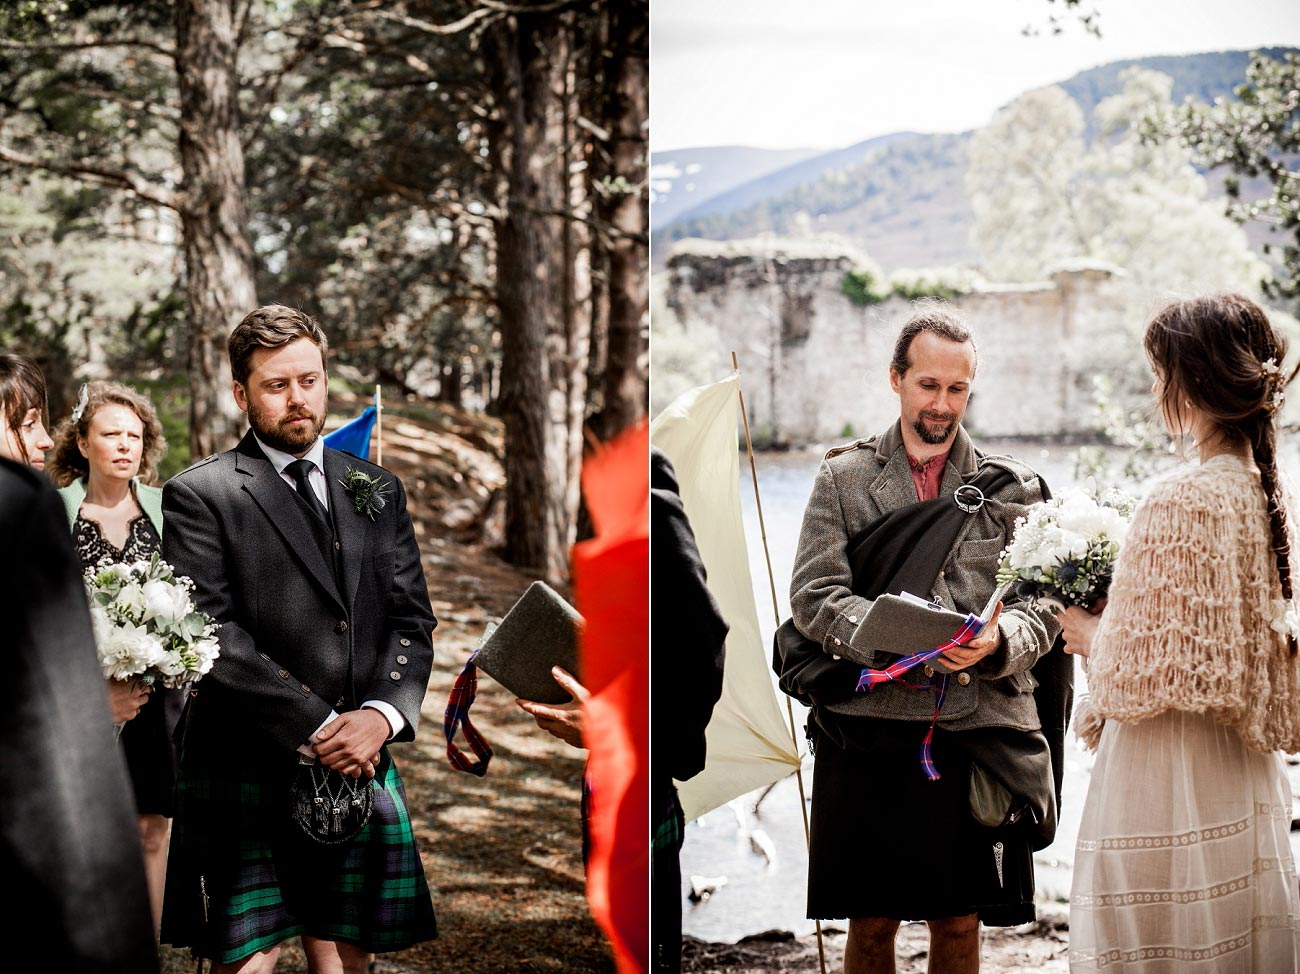 Forest wedding photography, Loch an Eilen Rothiemurchurs, Cairngorms, Scottish Highlands